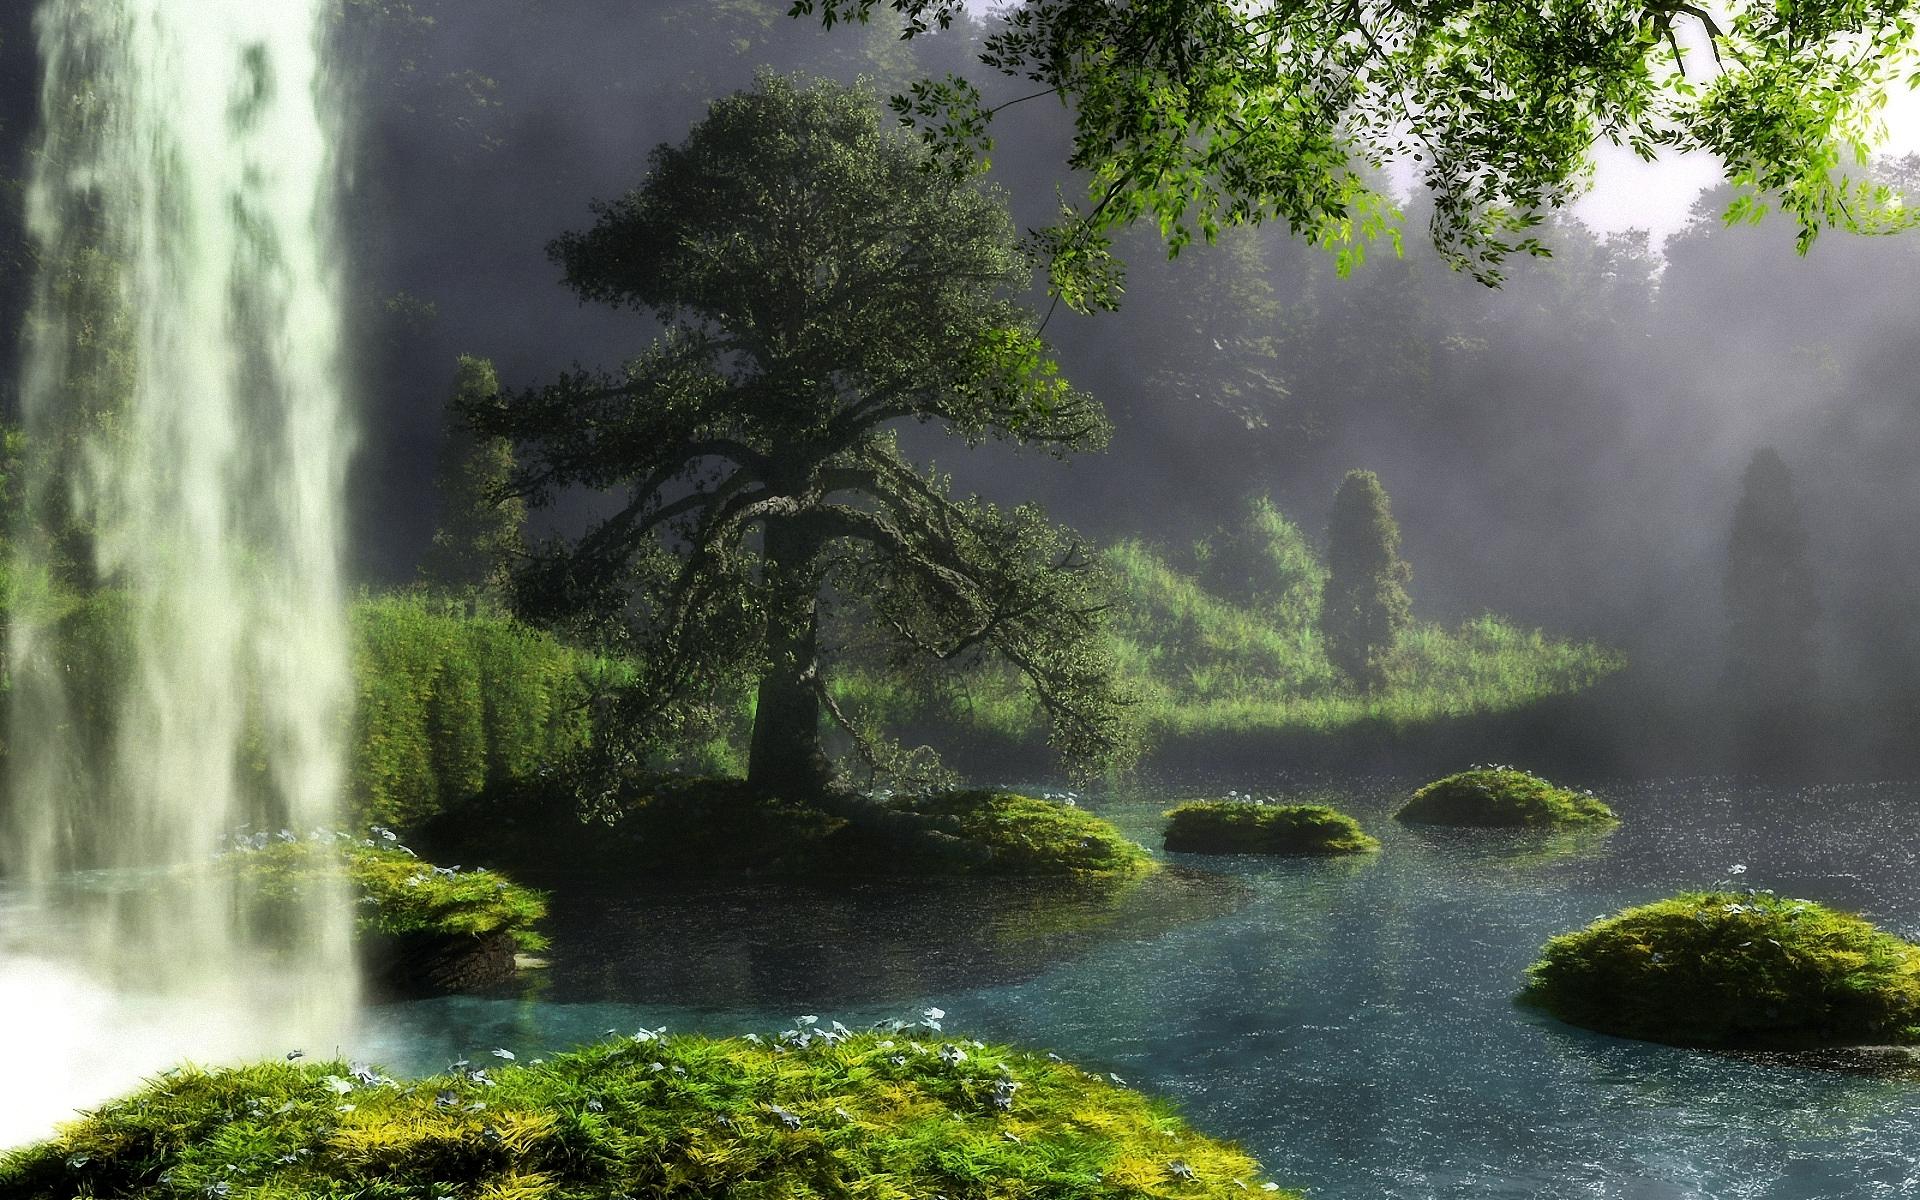 Forest Waterfall Wallpaper